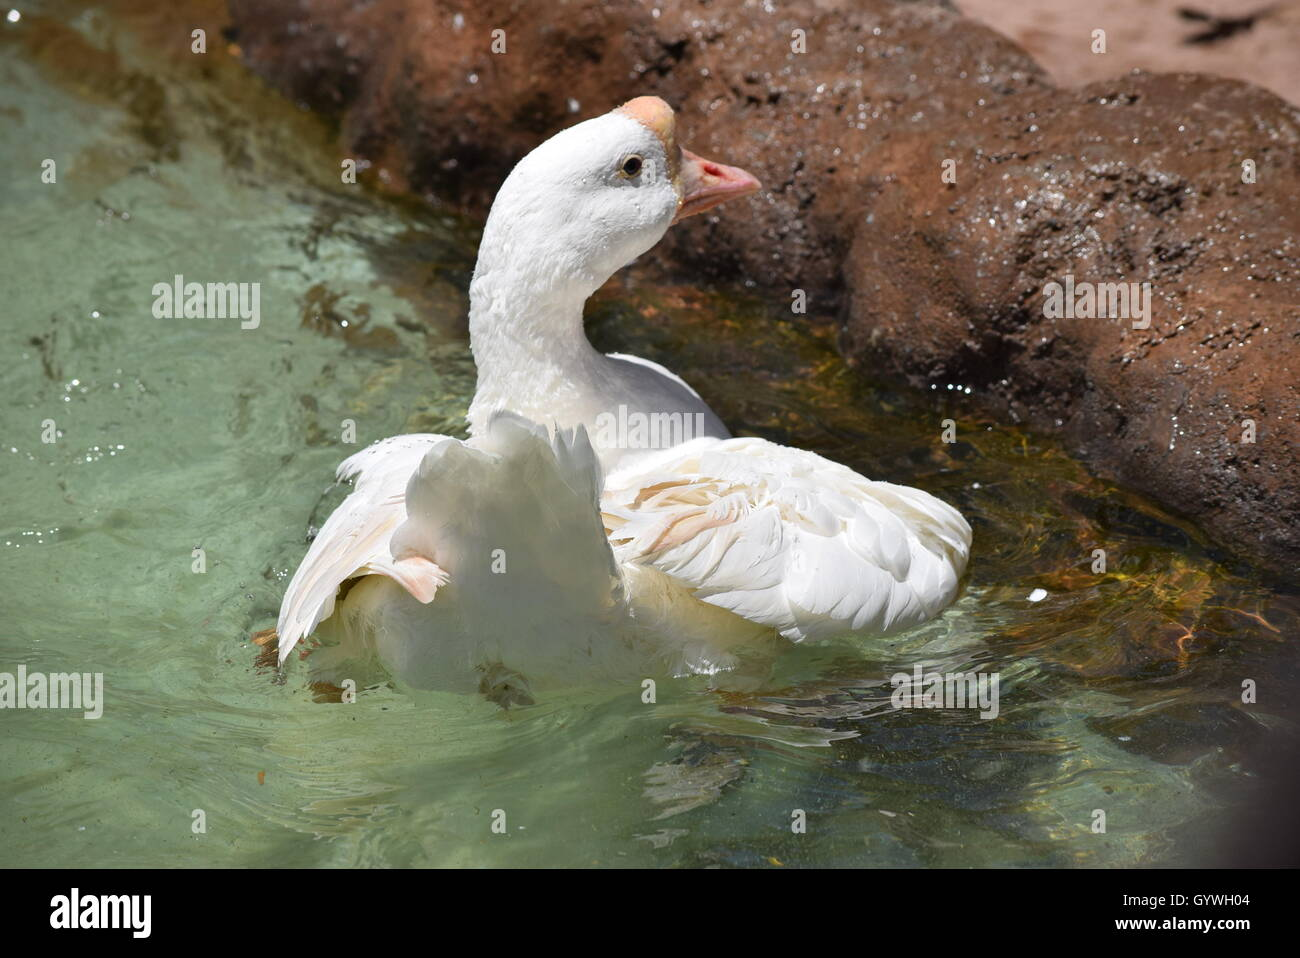 Swan Flapping in the Aurora Zoo, Guatemala - Stock Image